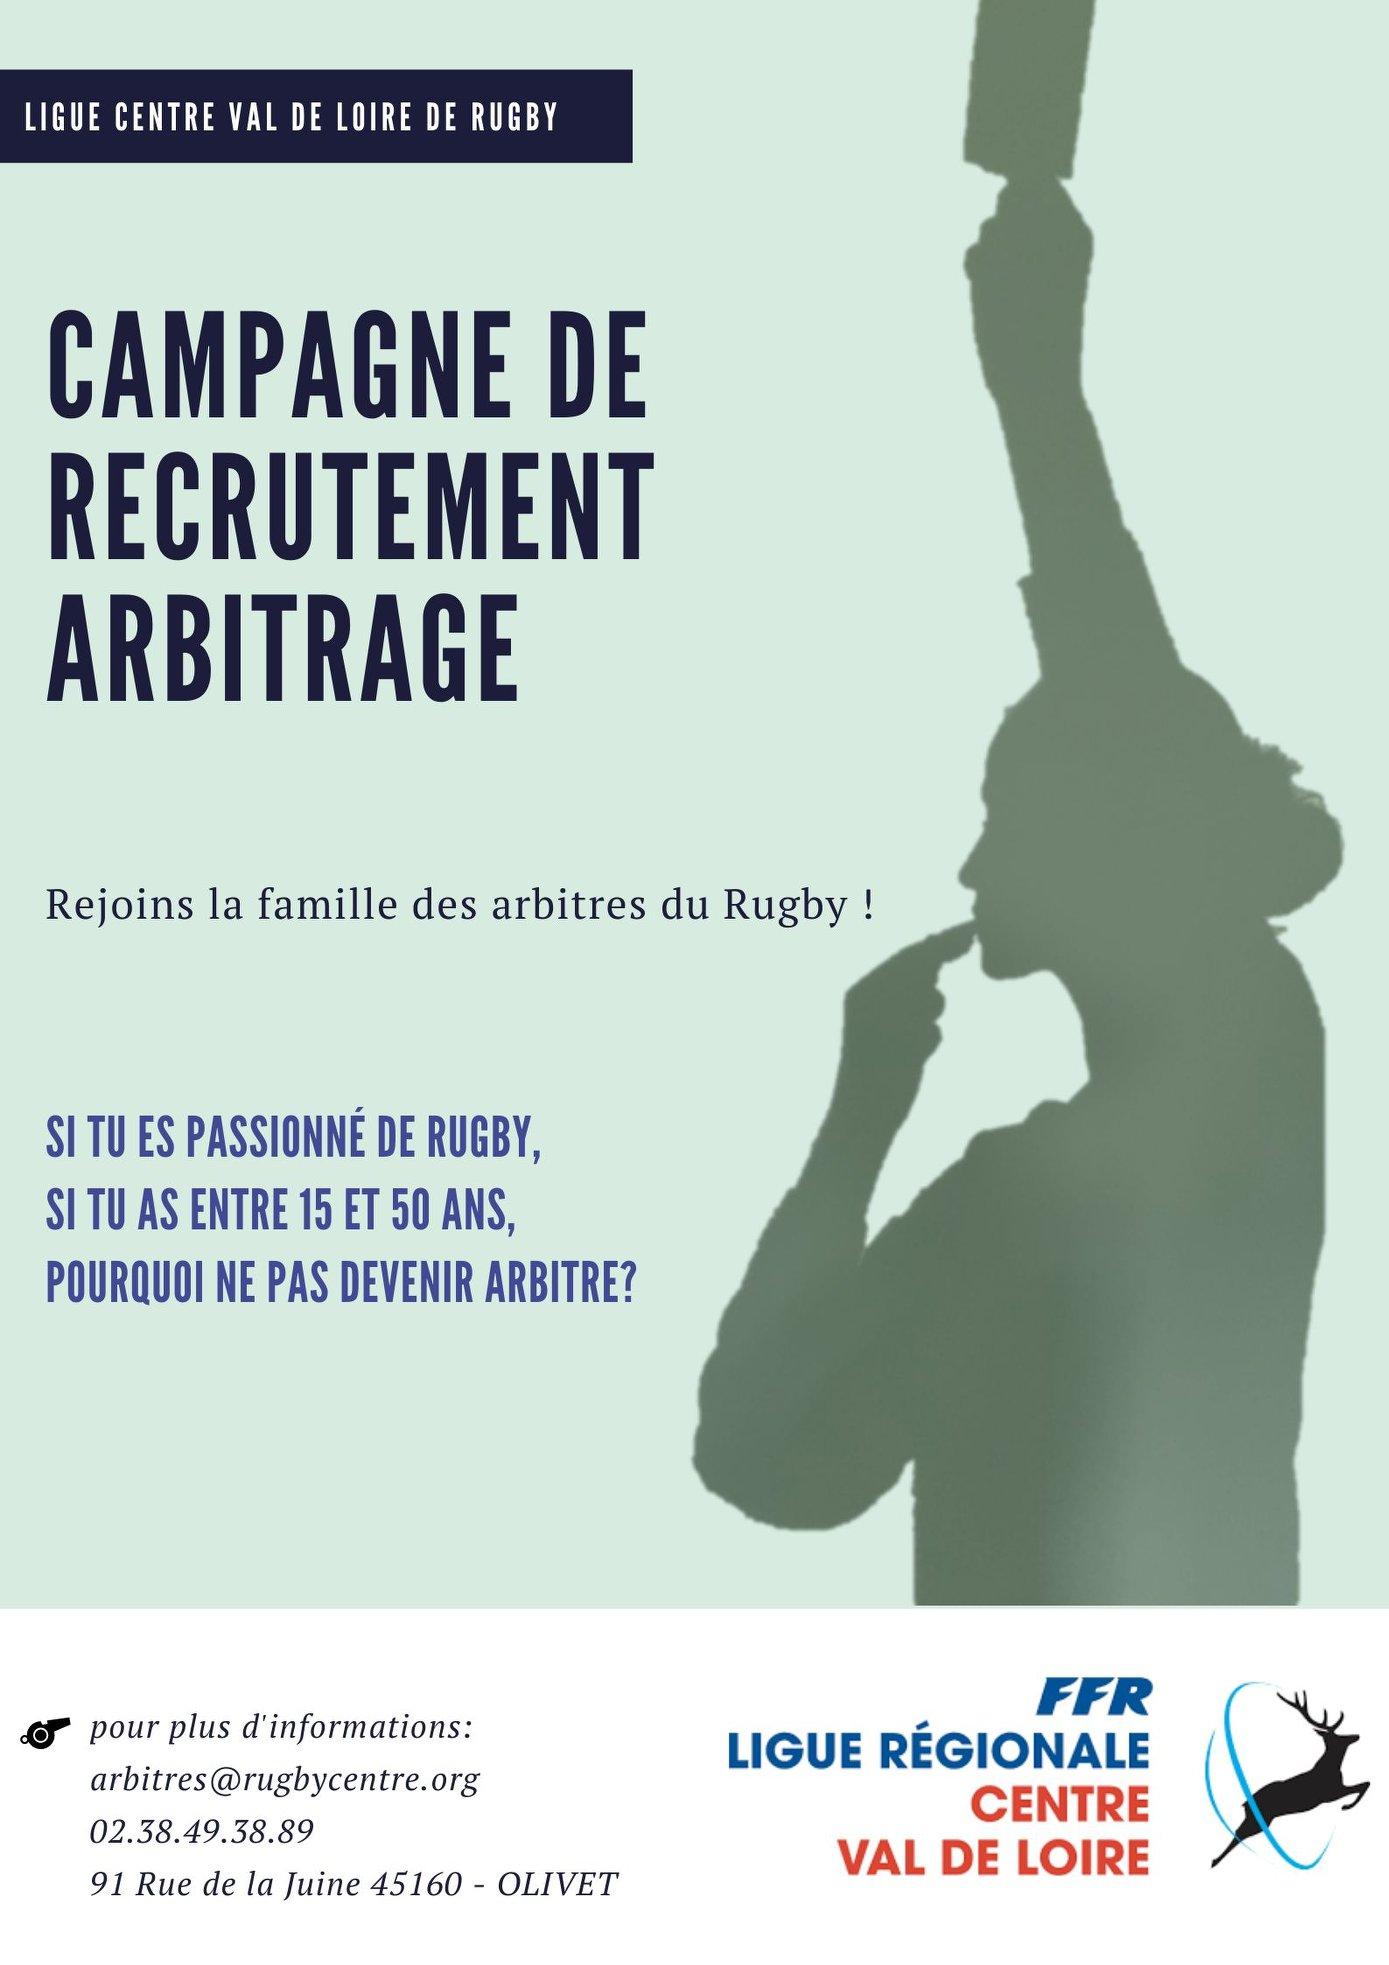 Campagne de recrutement arbitrage